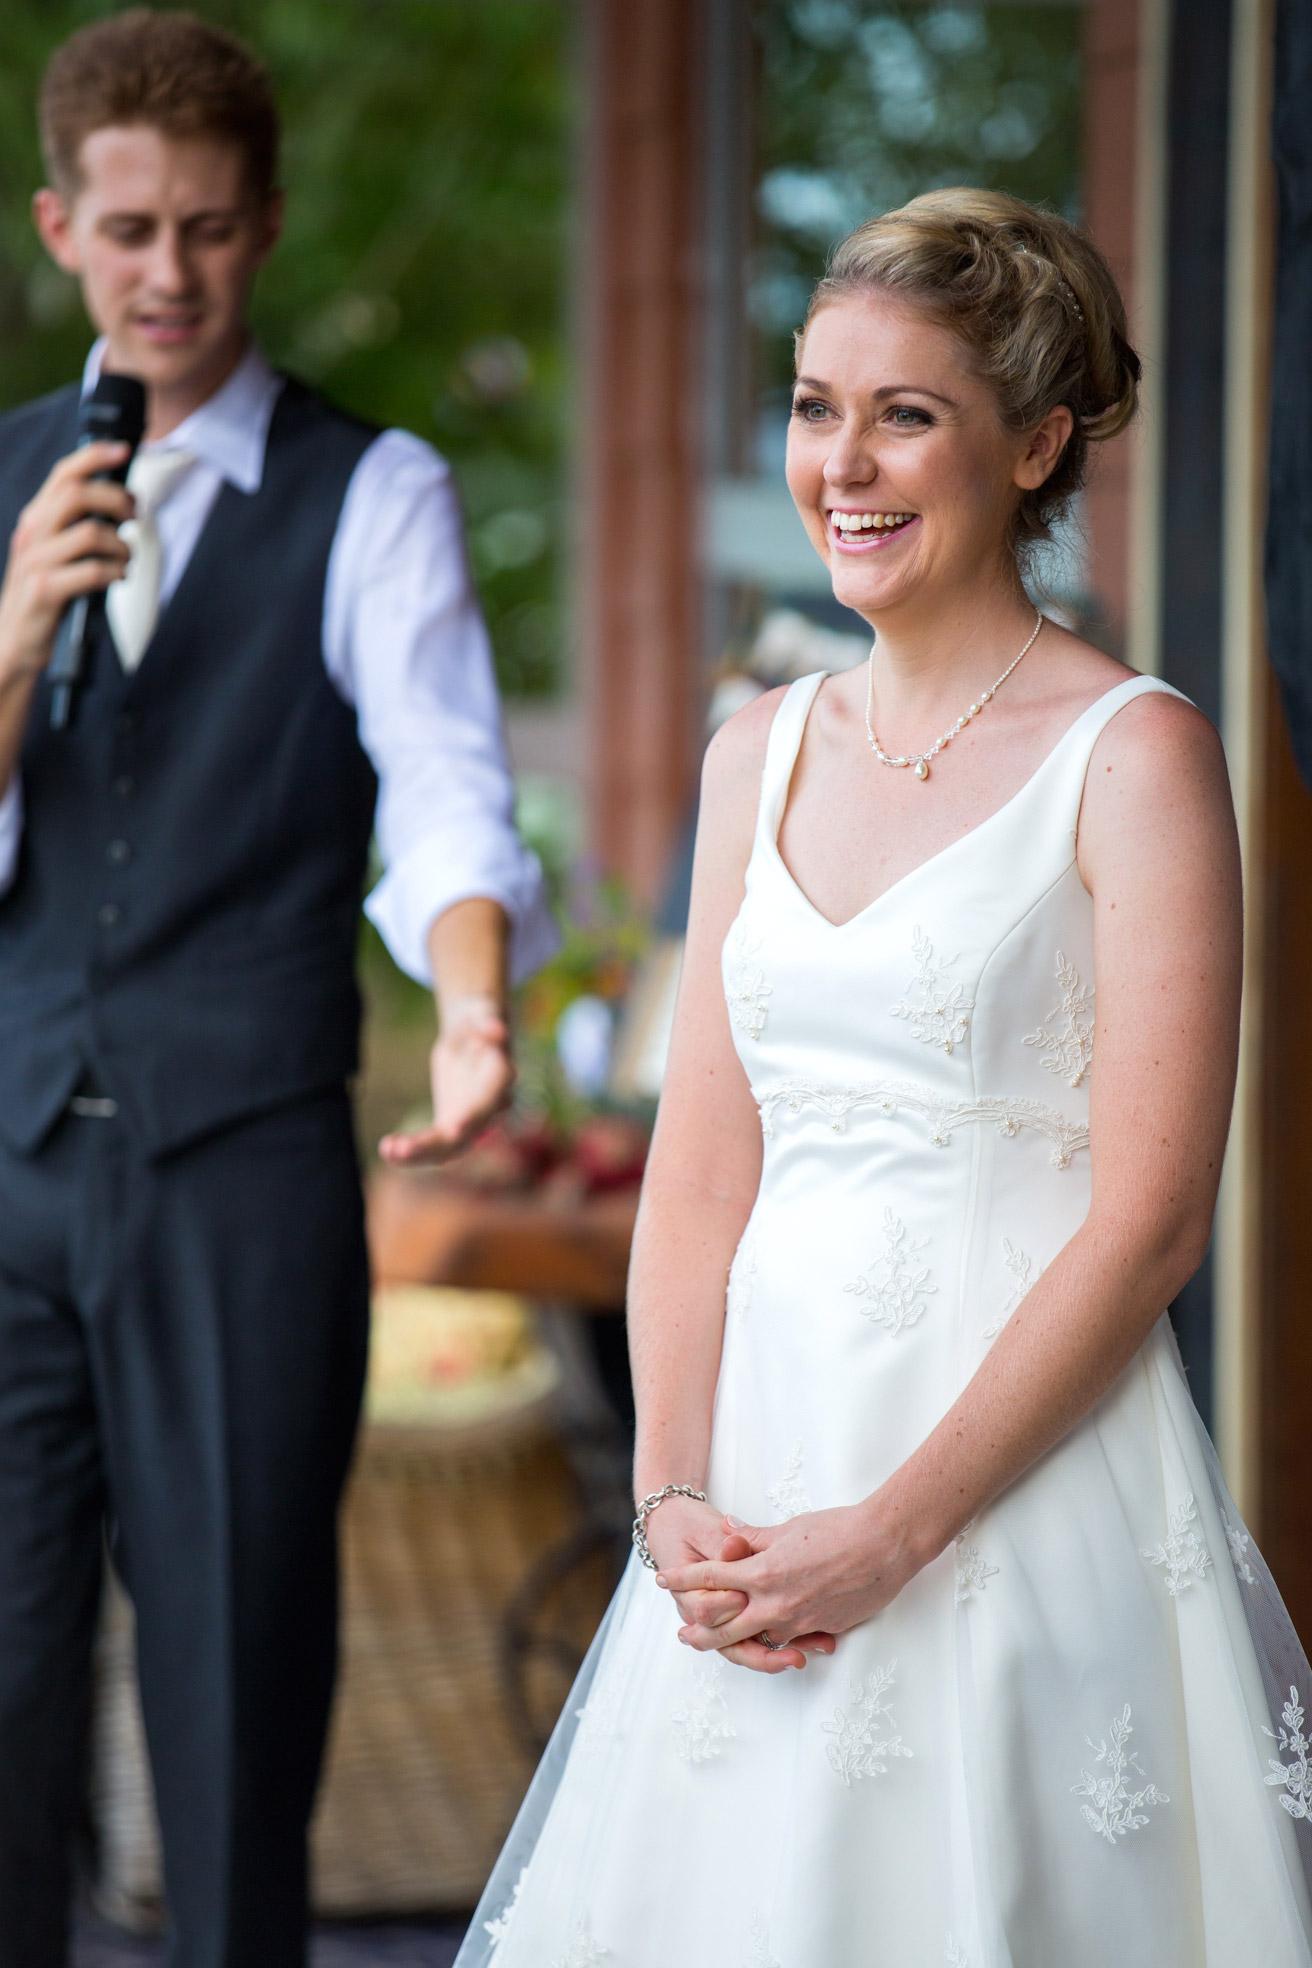 1-sunshine-coast-wedding-photography-all-the-love-in-the-world-noosa-mooloolaba-glasshouse-brisbane-katie-ryan5556.jpg